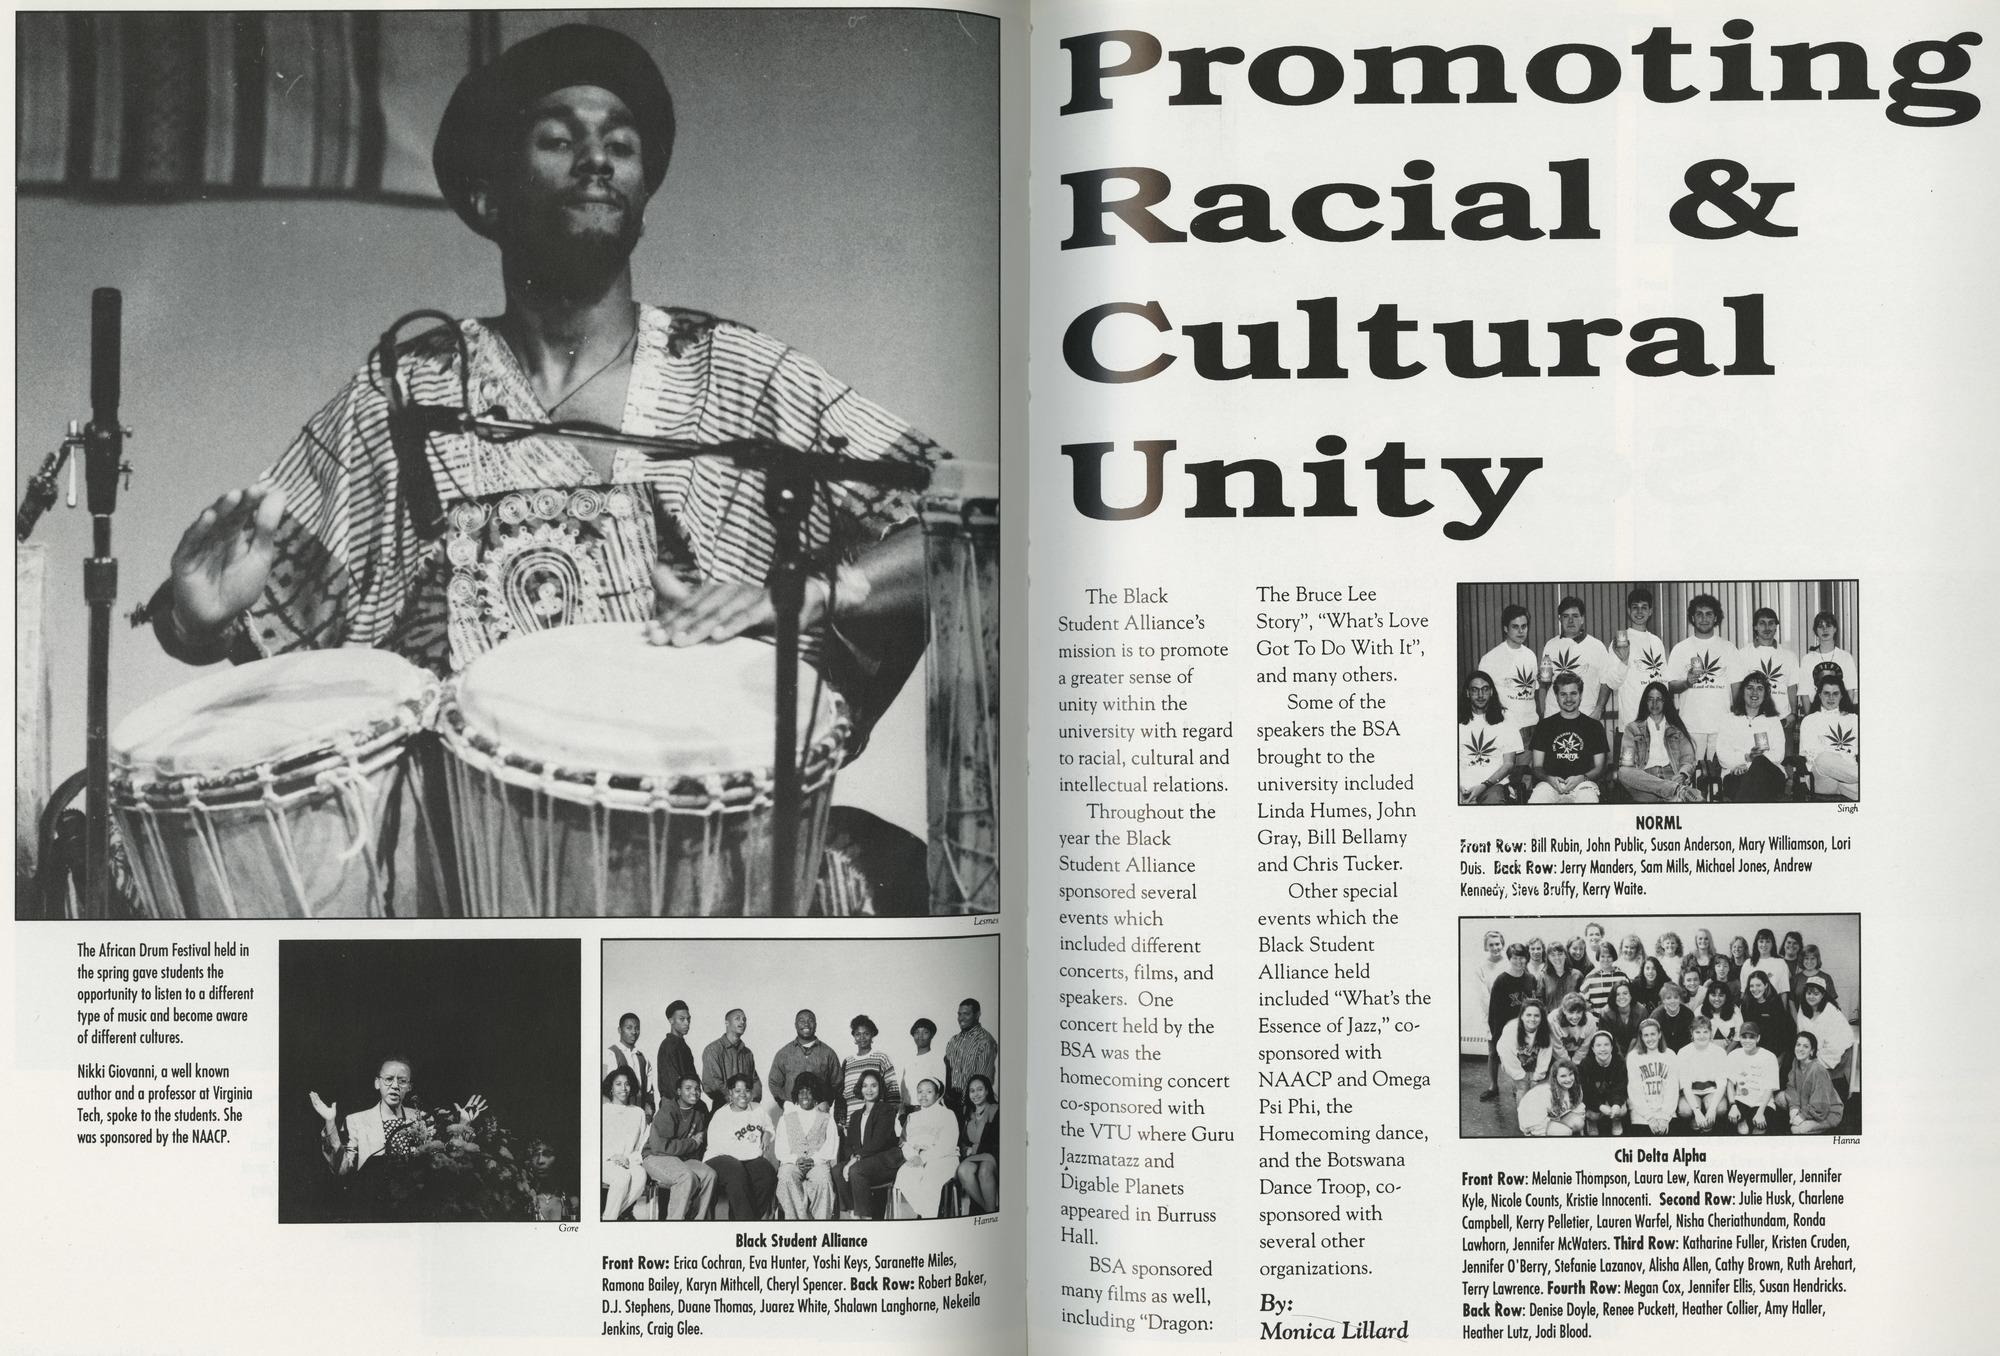 http://spec.lib.vt.edu/pickup/Omeka_upload/Bugle1994_pg236-237_Diversity.jpg